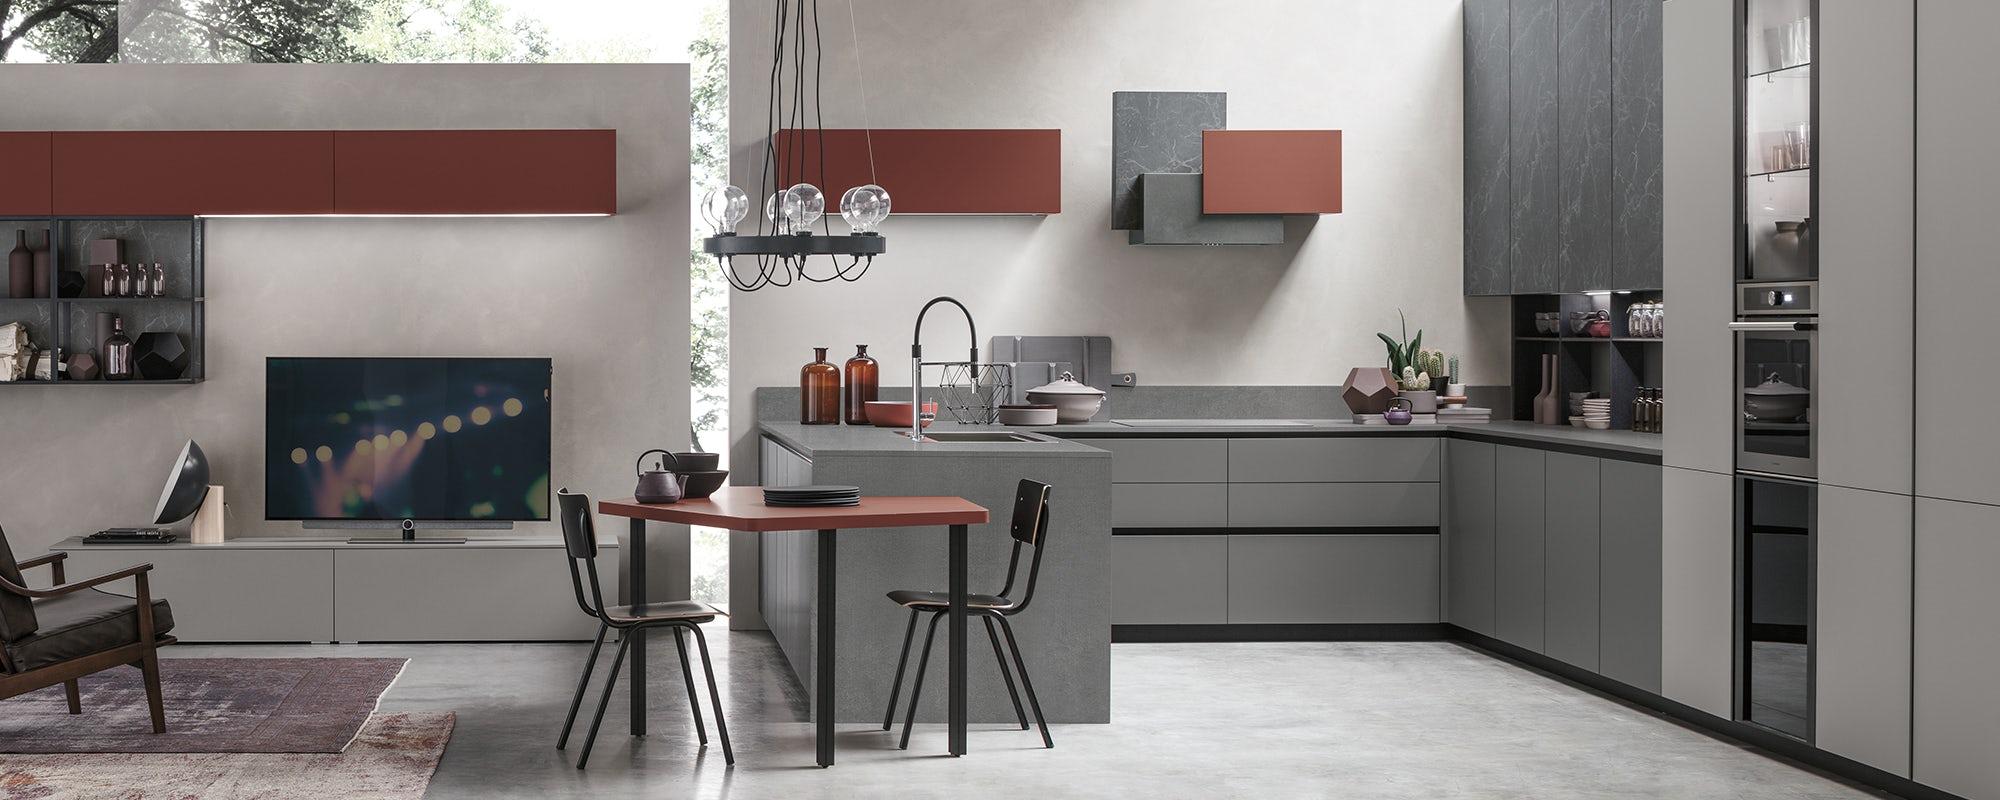 Stosa Cucine - Modern & classic kitchens